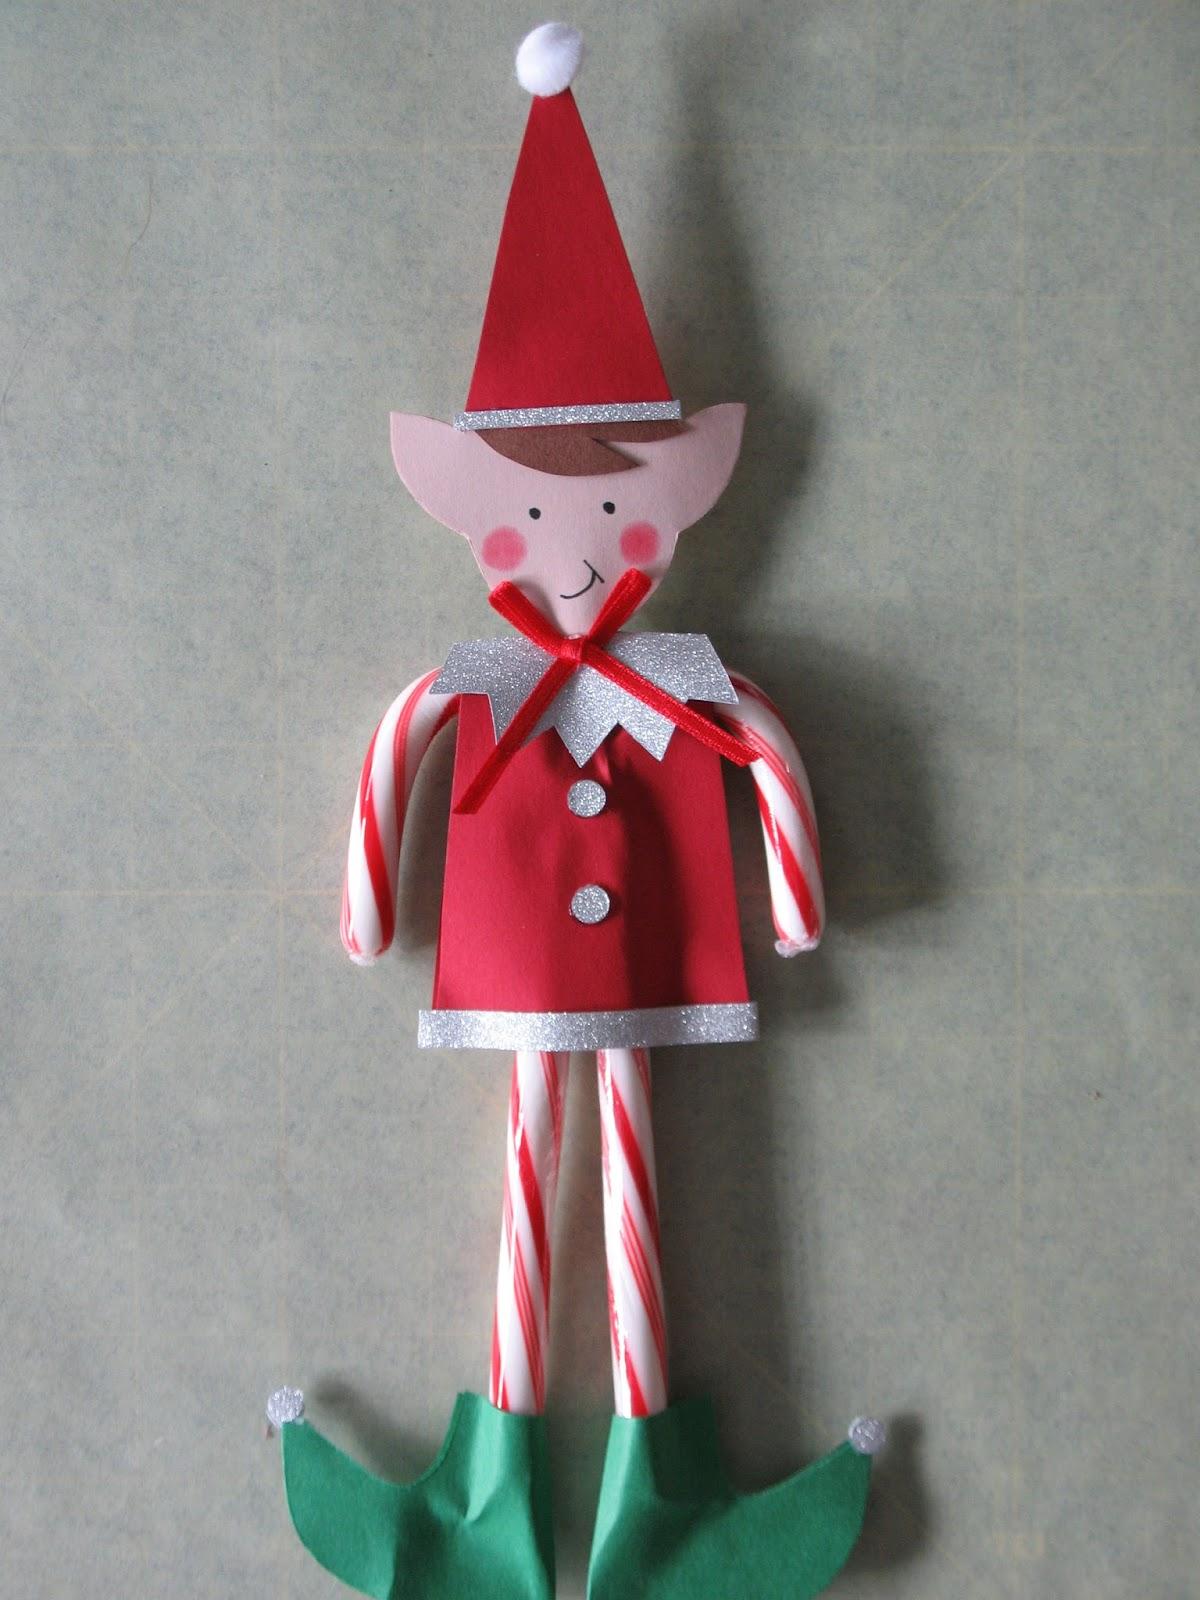 Artsy Fartsy Candy Cane Elves